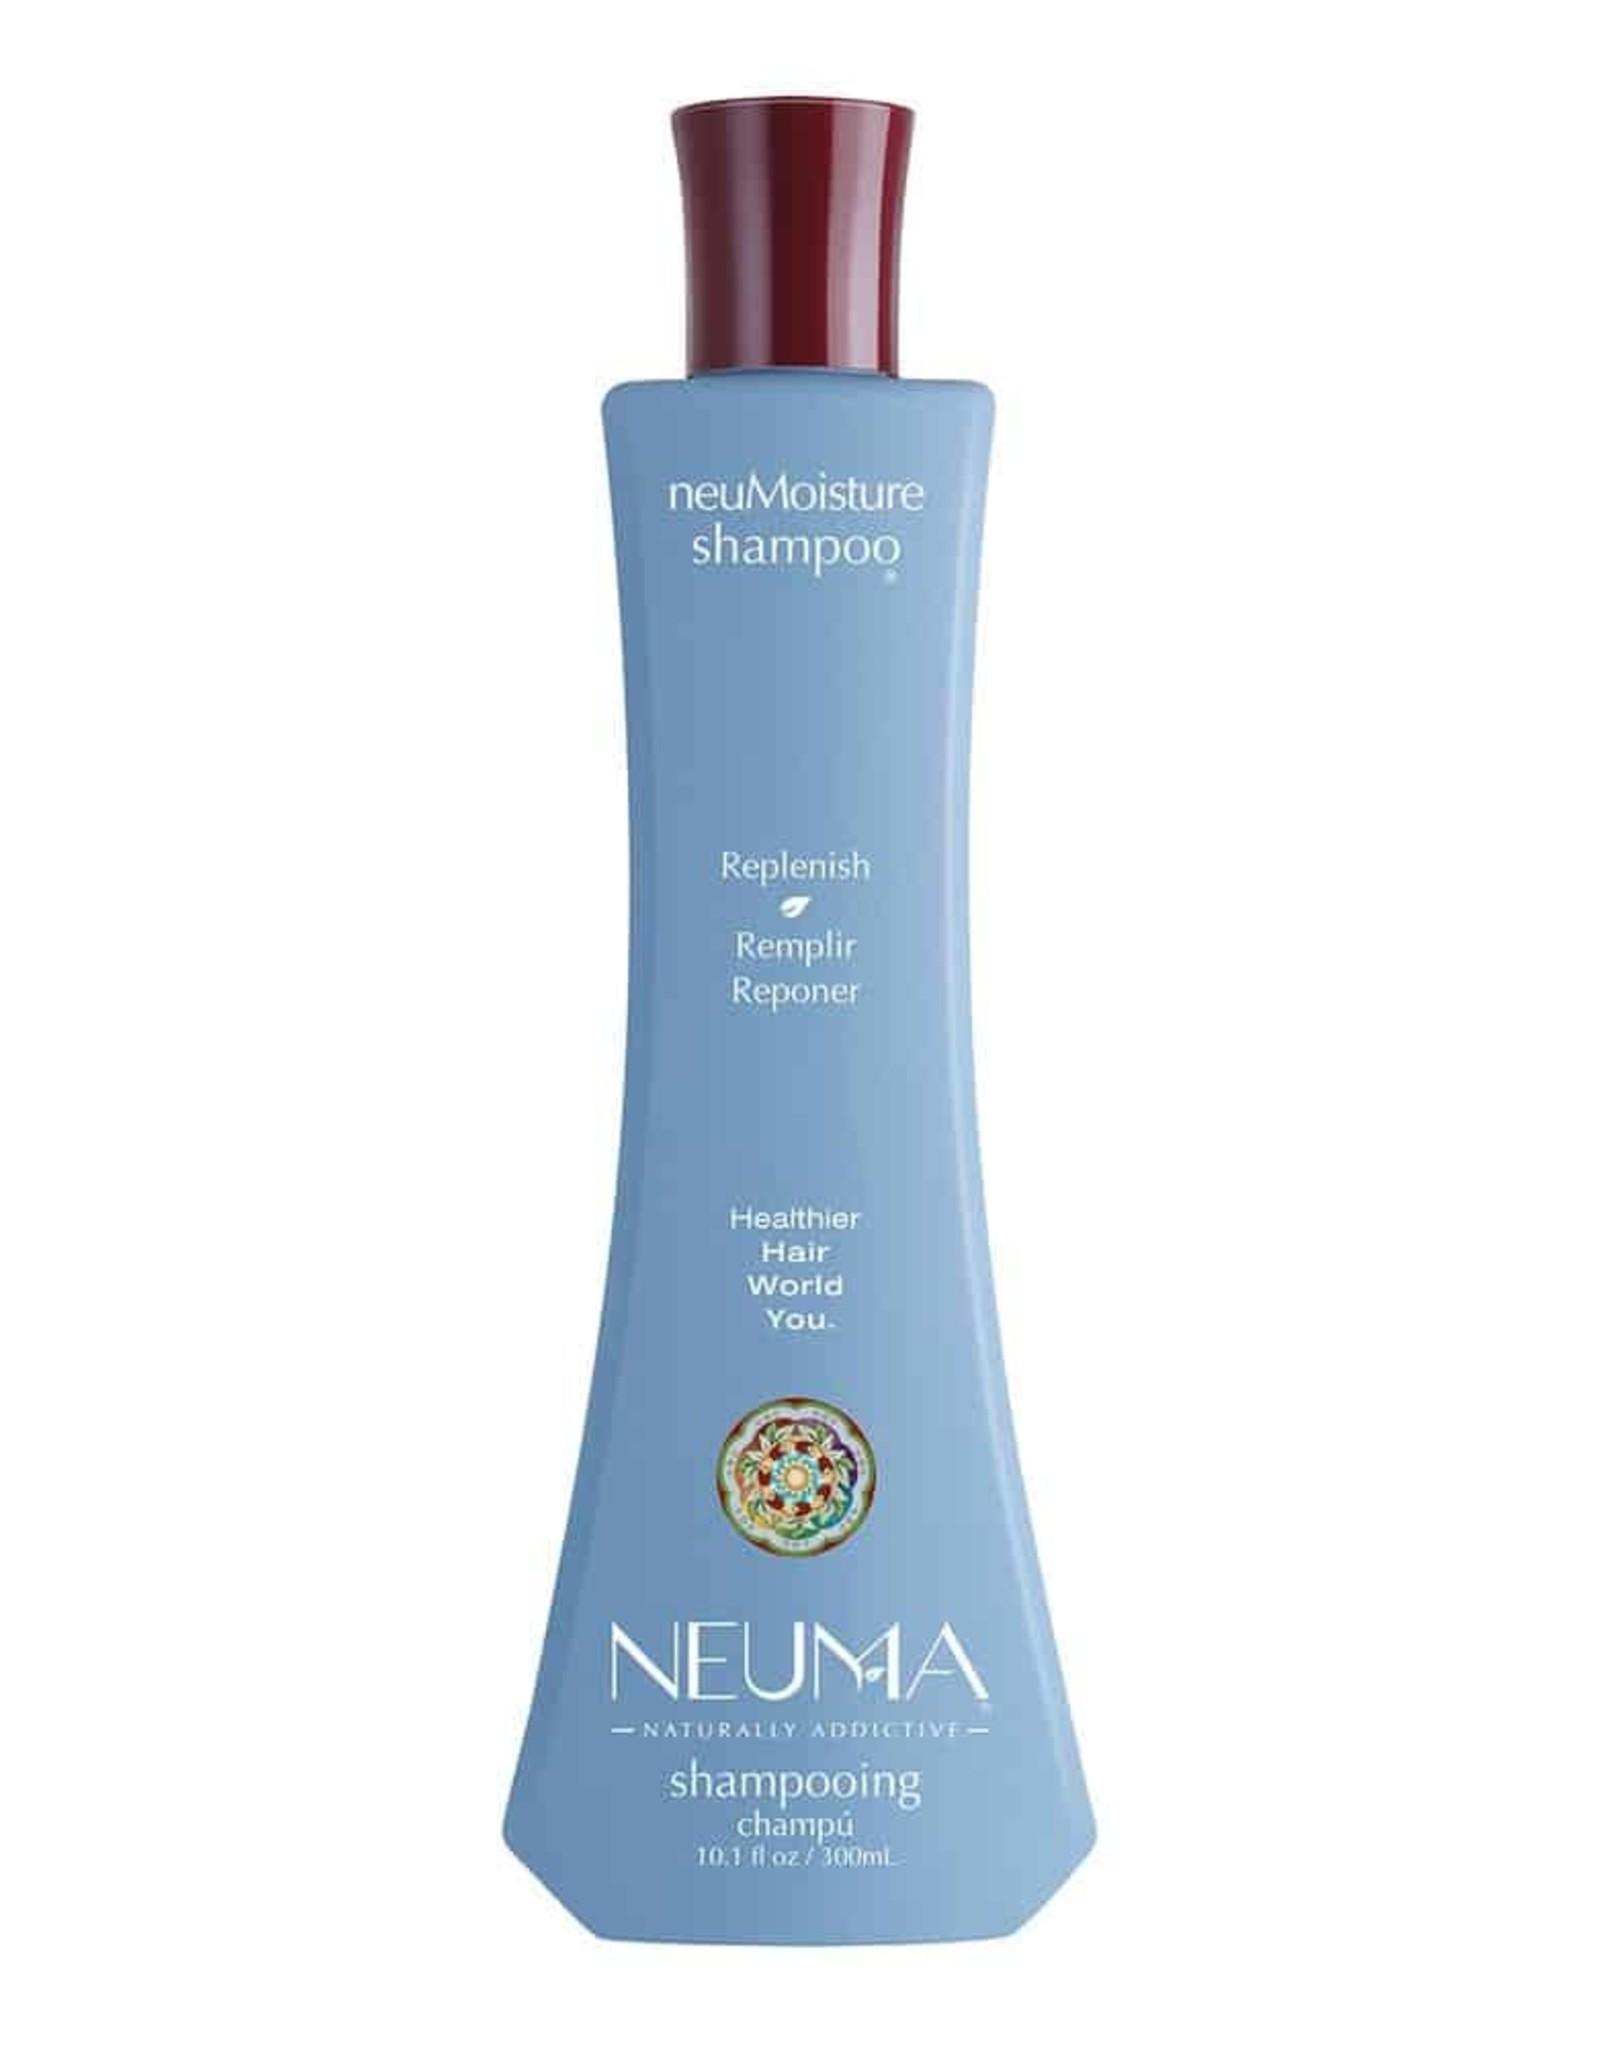 Neuma neuMoisture Shampoo